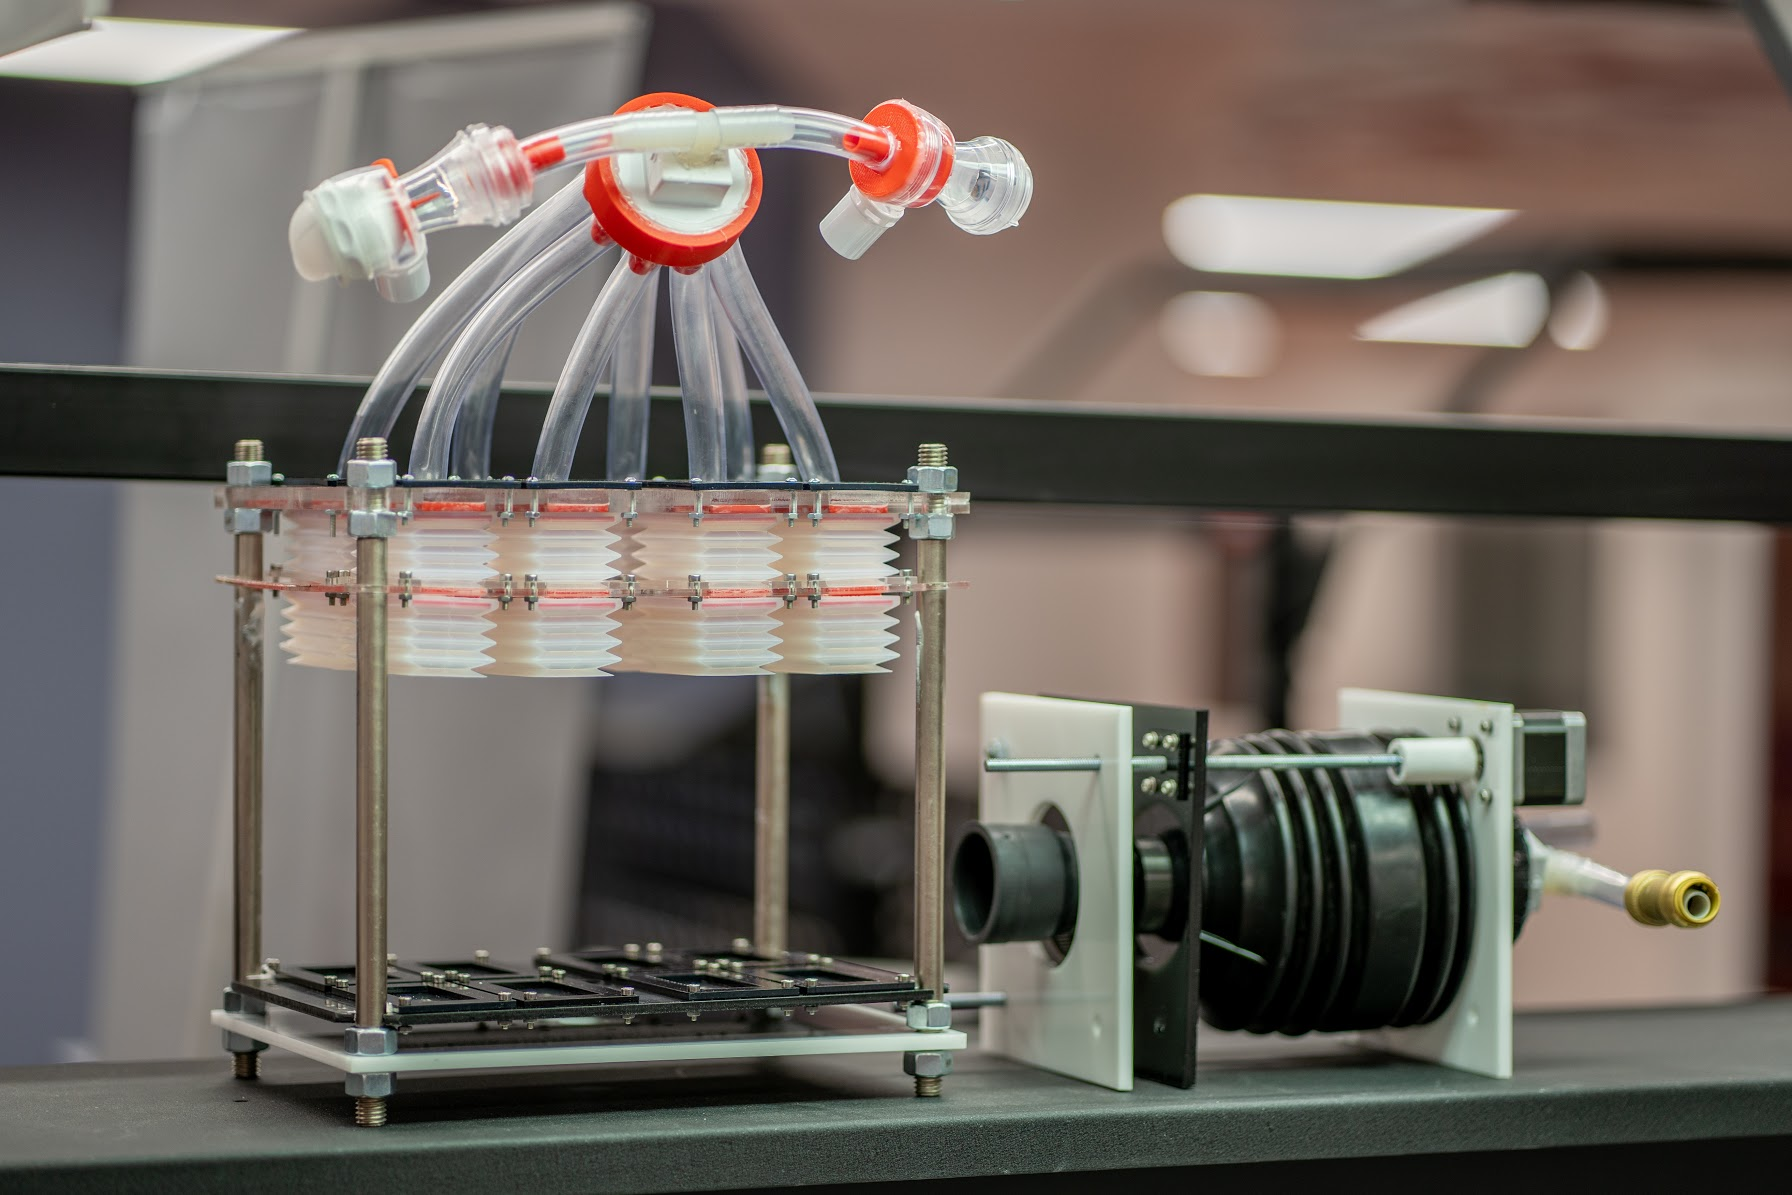 Ventilator Production: A Global Need